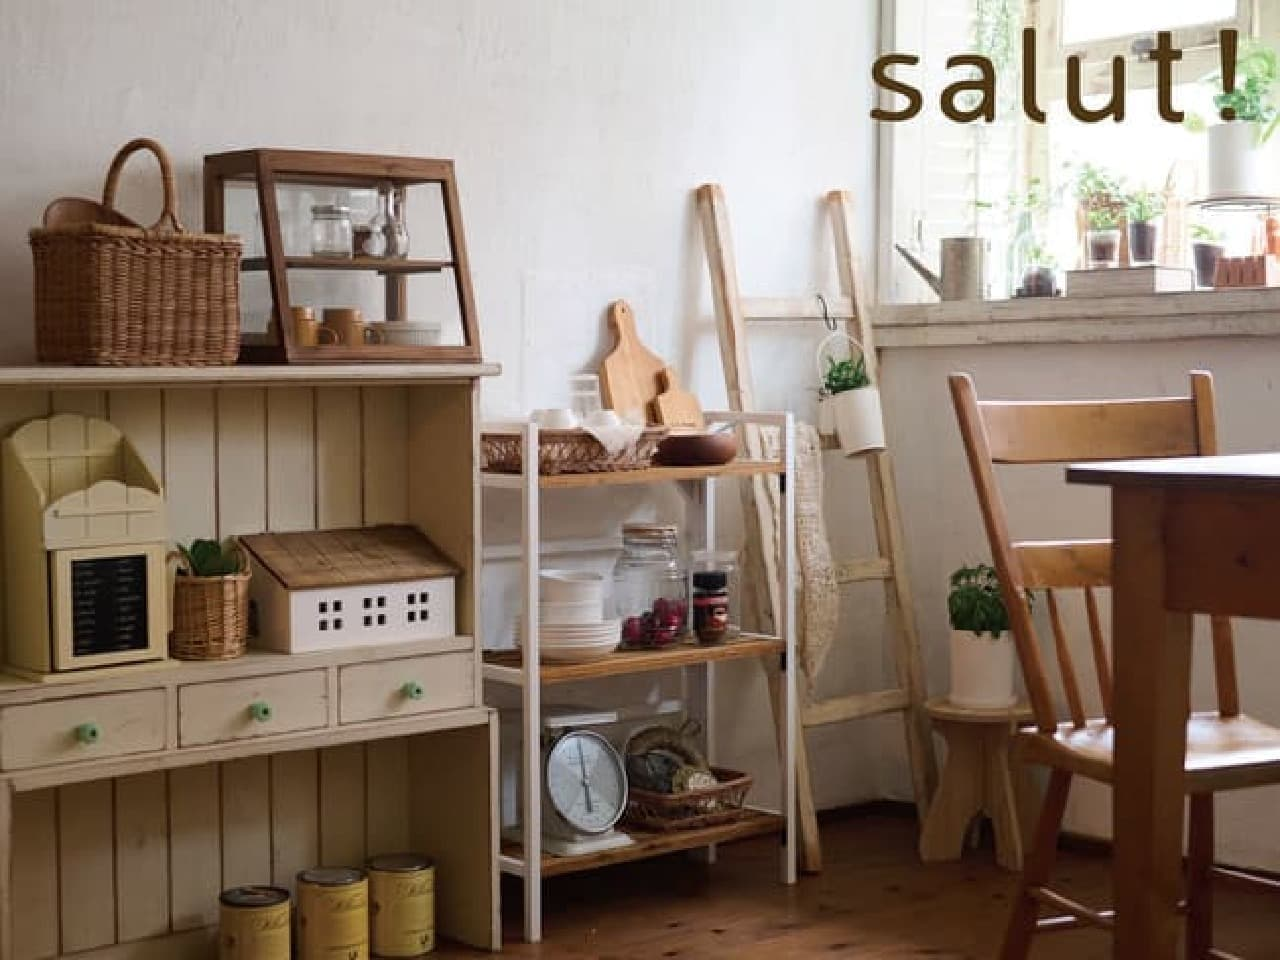 salut!×ムーミンのコラボ -- キッチン雑貨・室内防寒アイテムなど